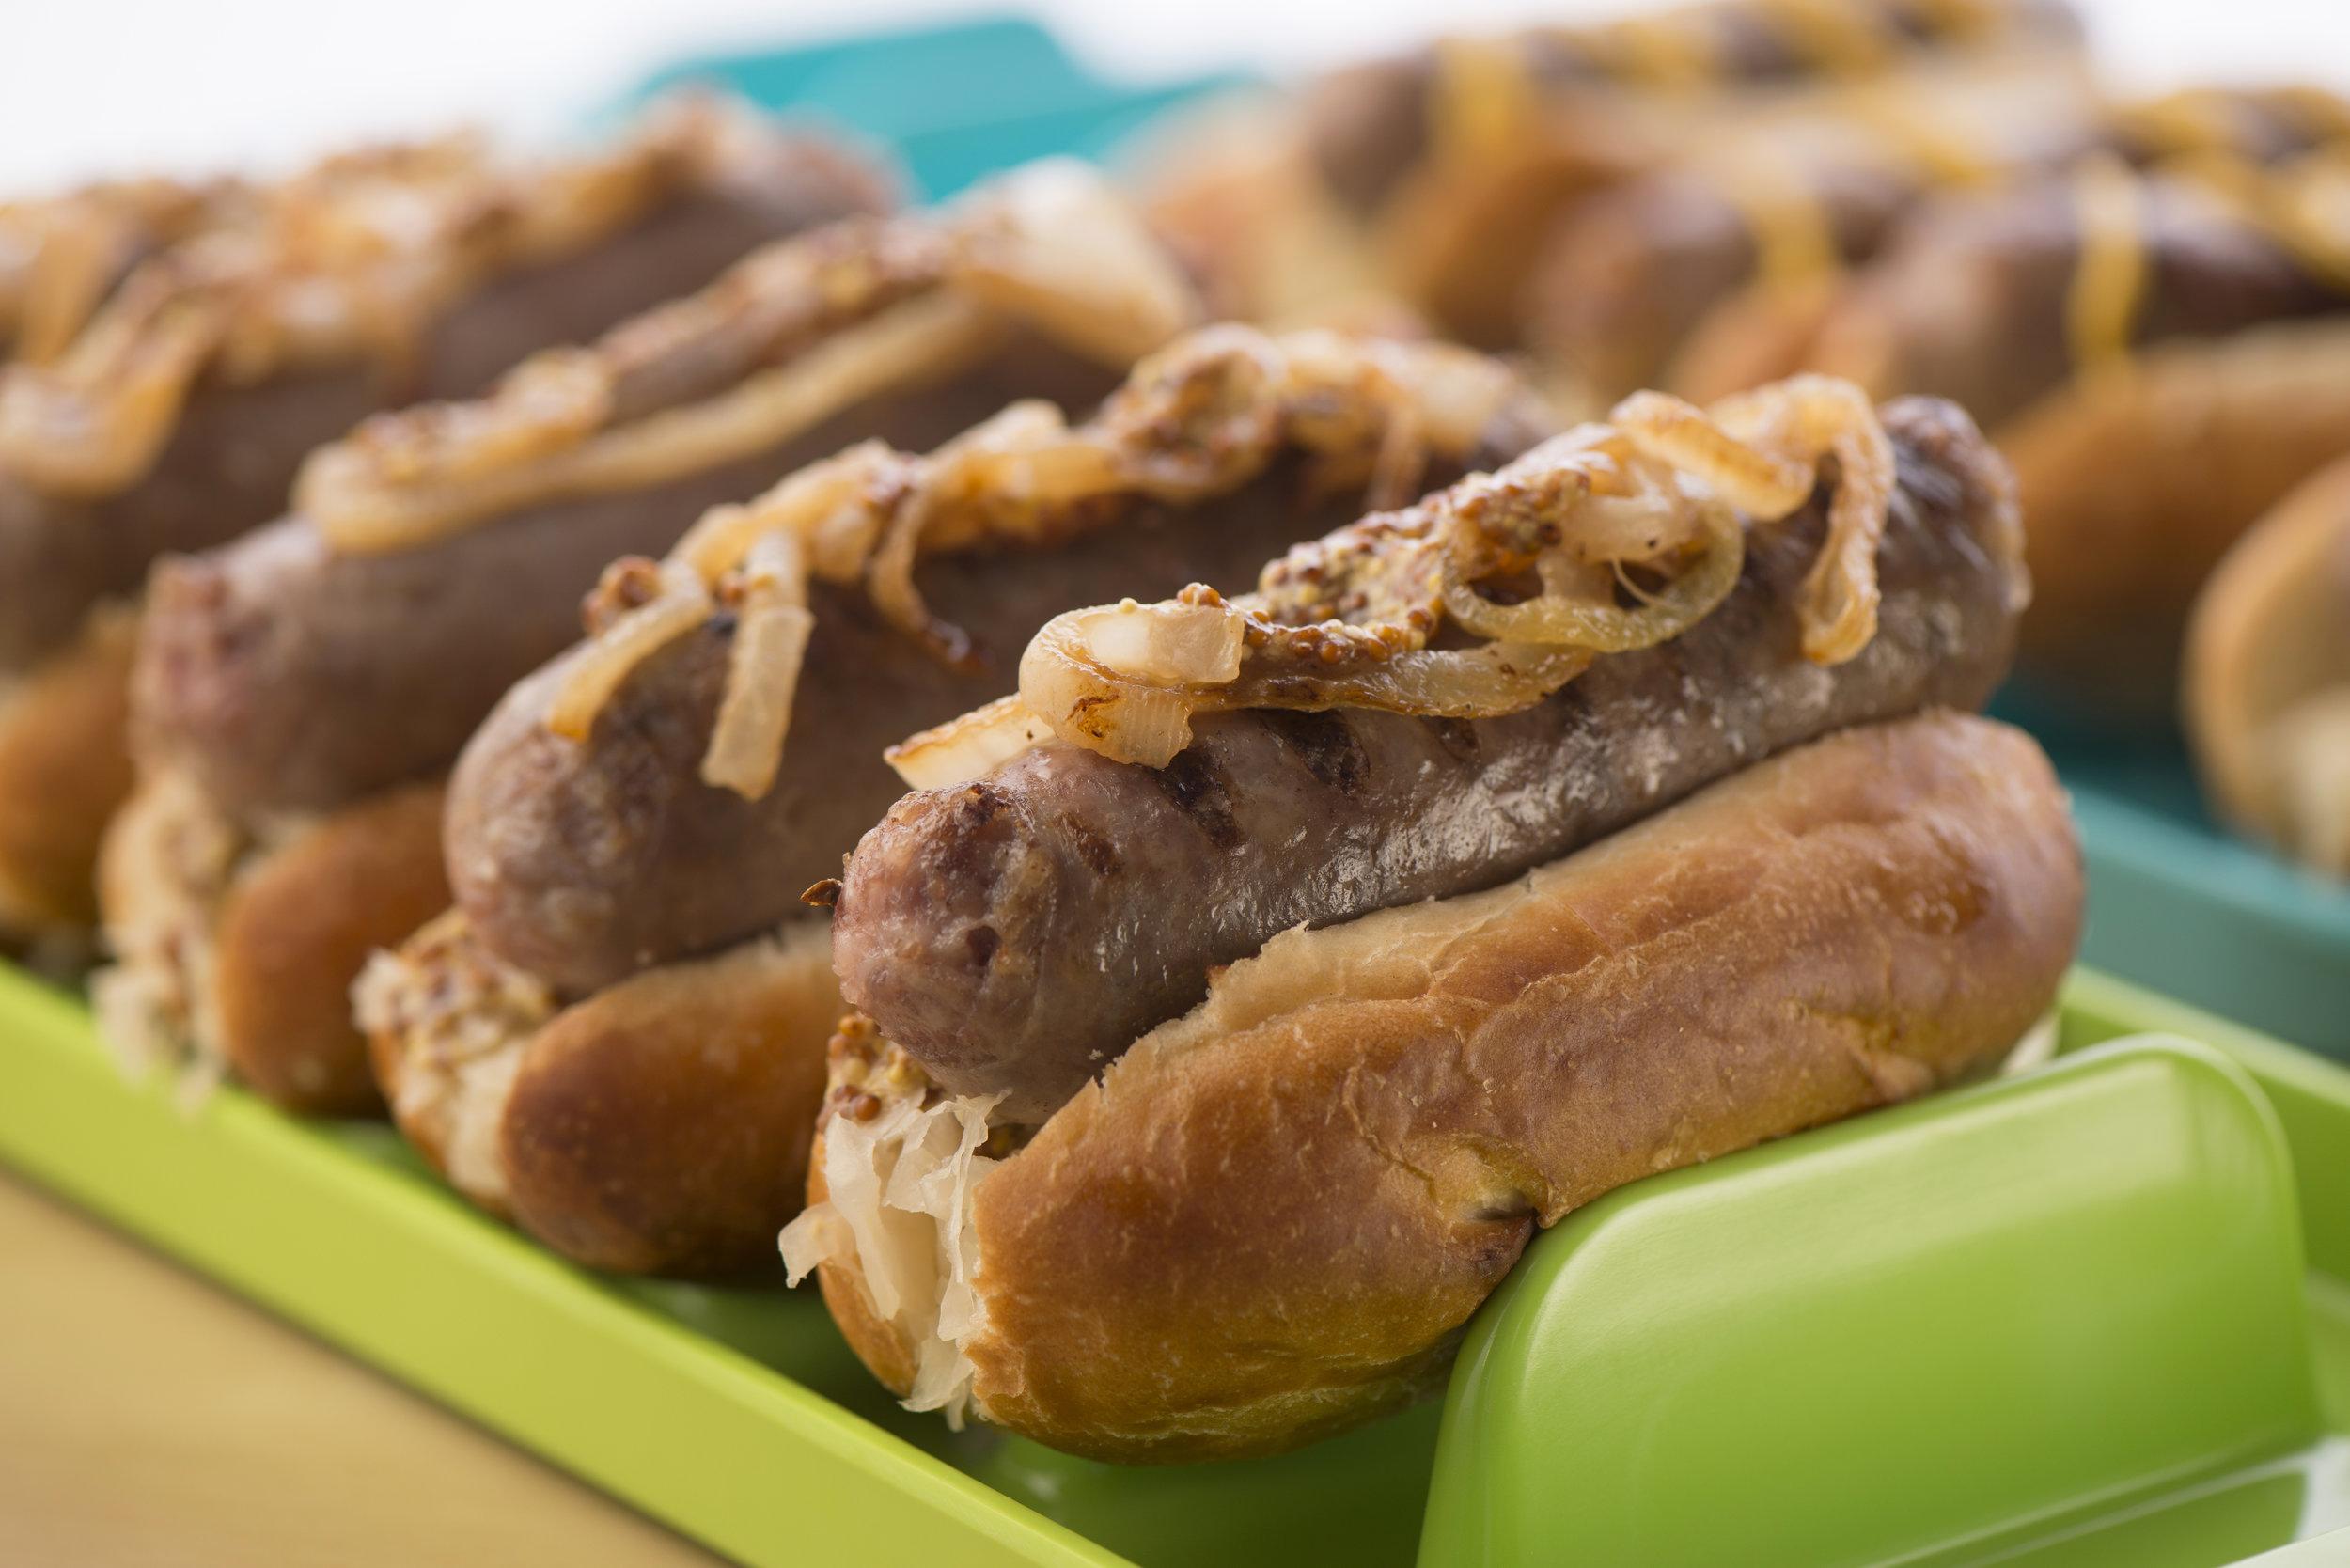 4. Apple Dijon Sauerkraut Brats - Tradition says that pork and sauerkraut bring good luck, so load your brat with some sauerkraut to send some luck to your favorite team!